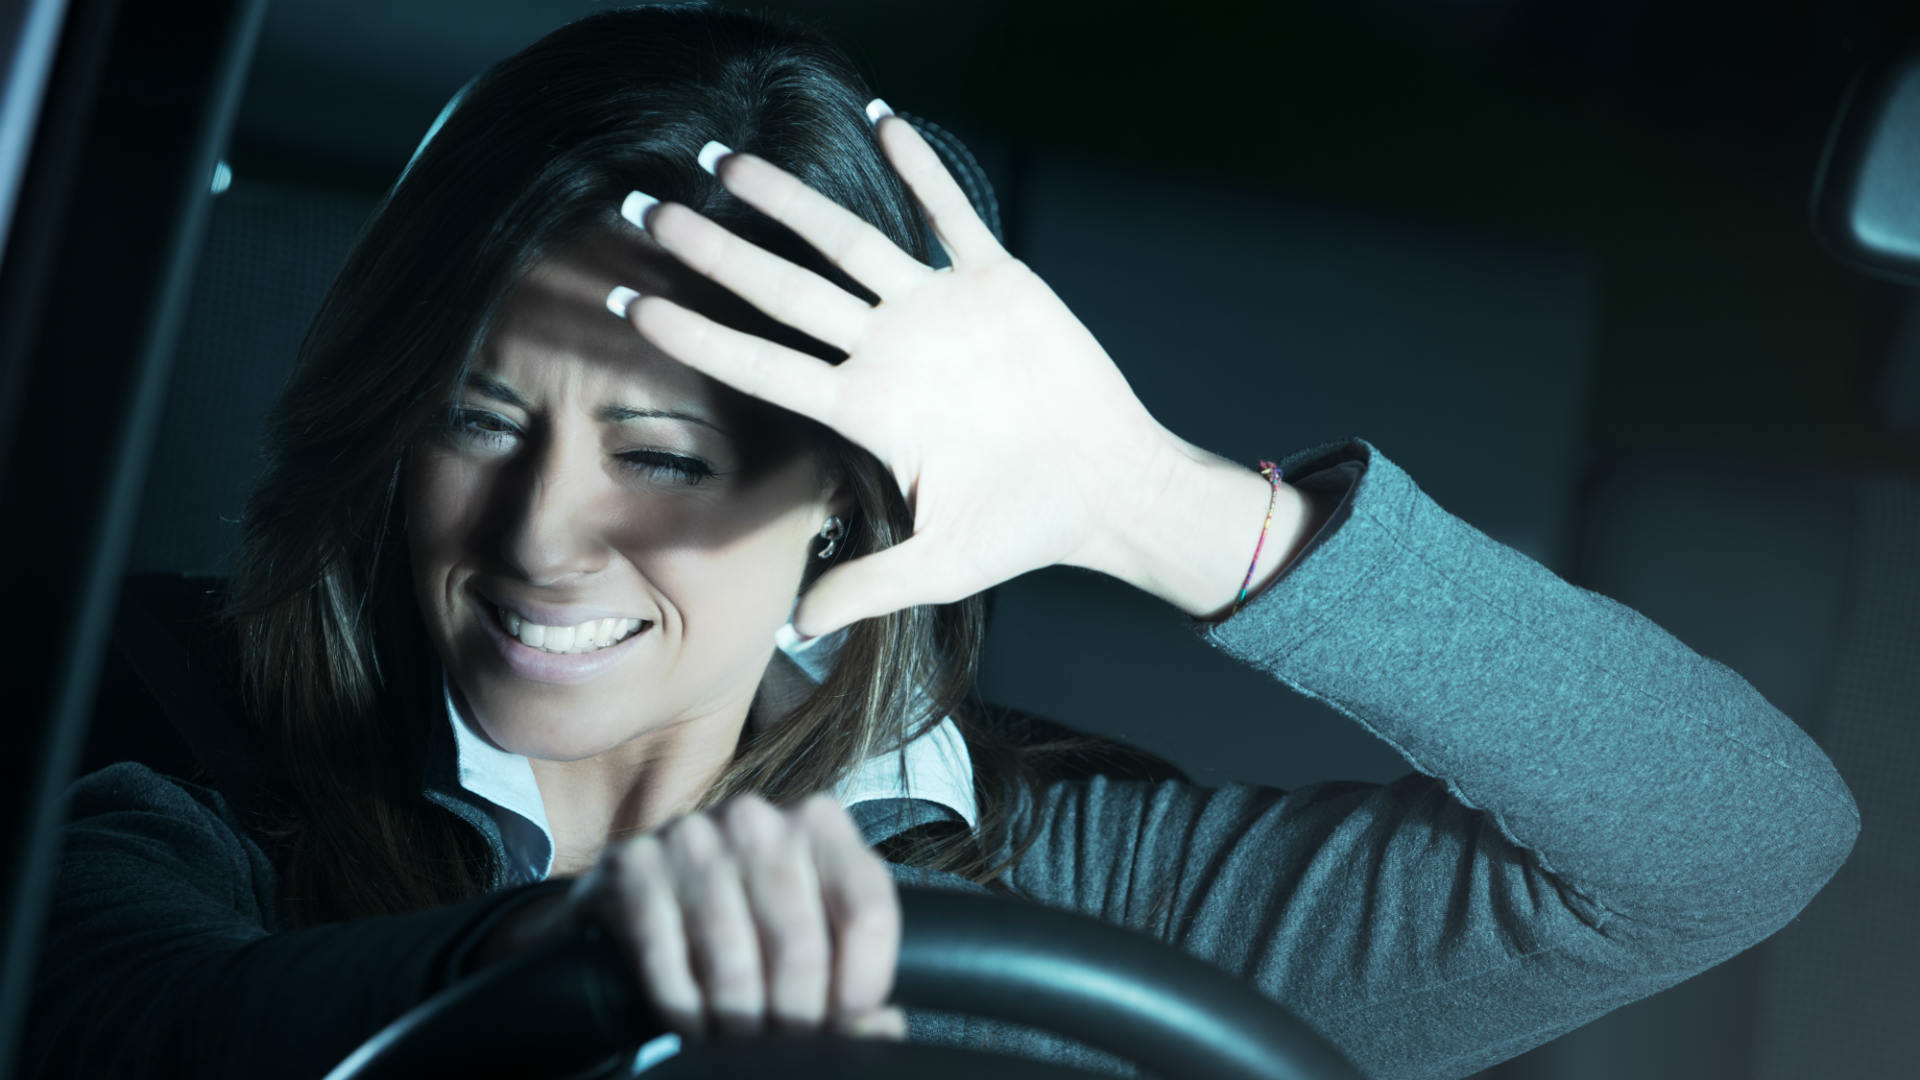 Glare when driving in the dark